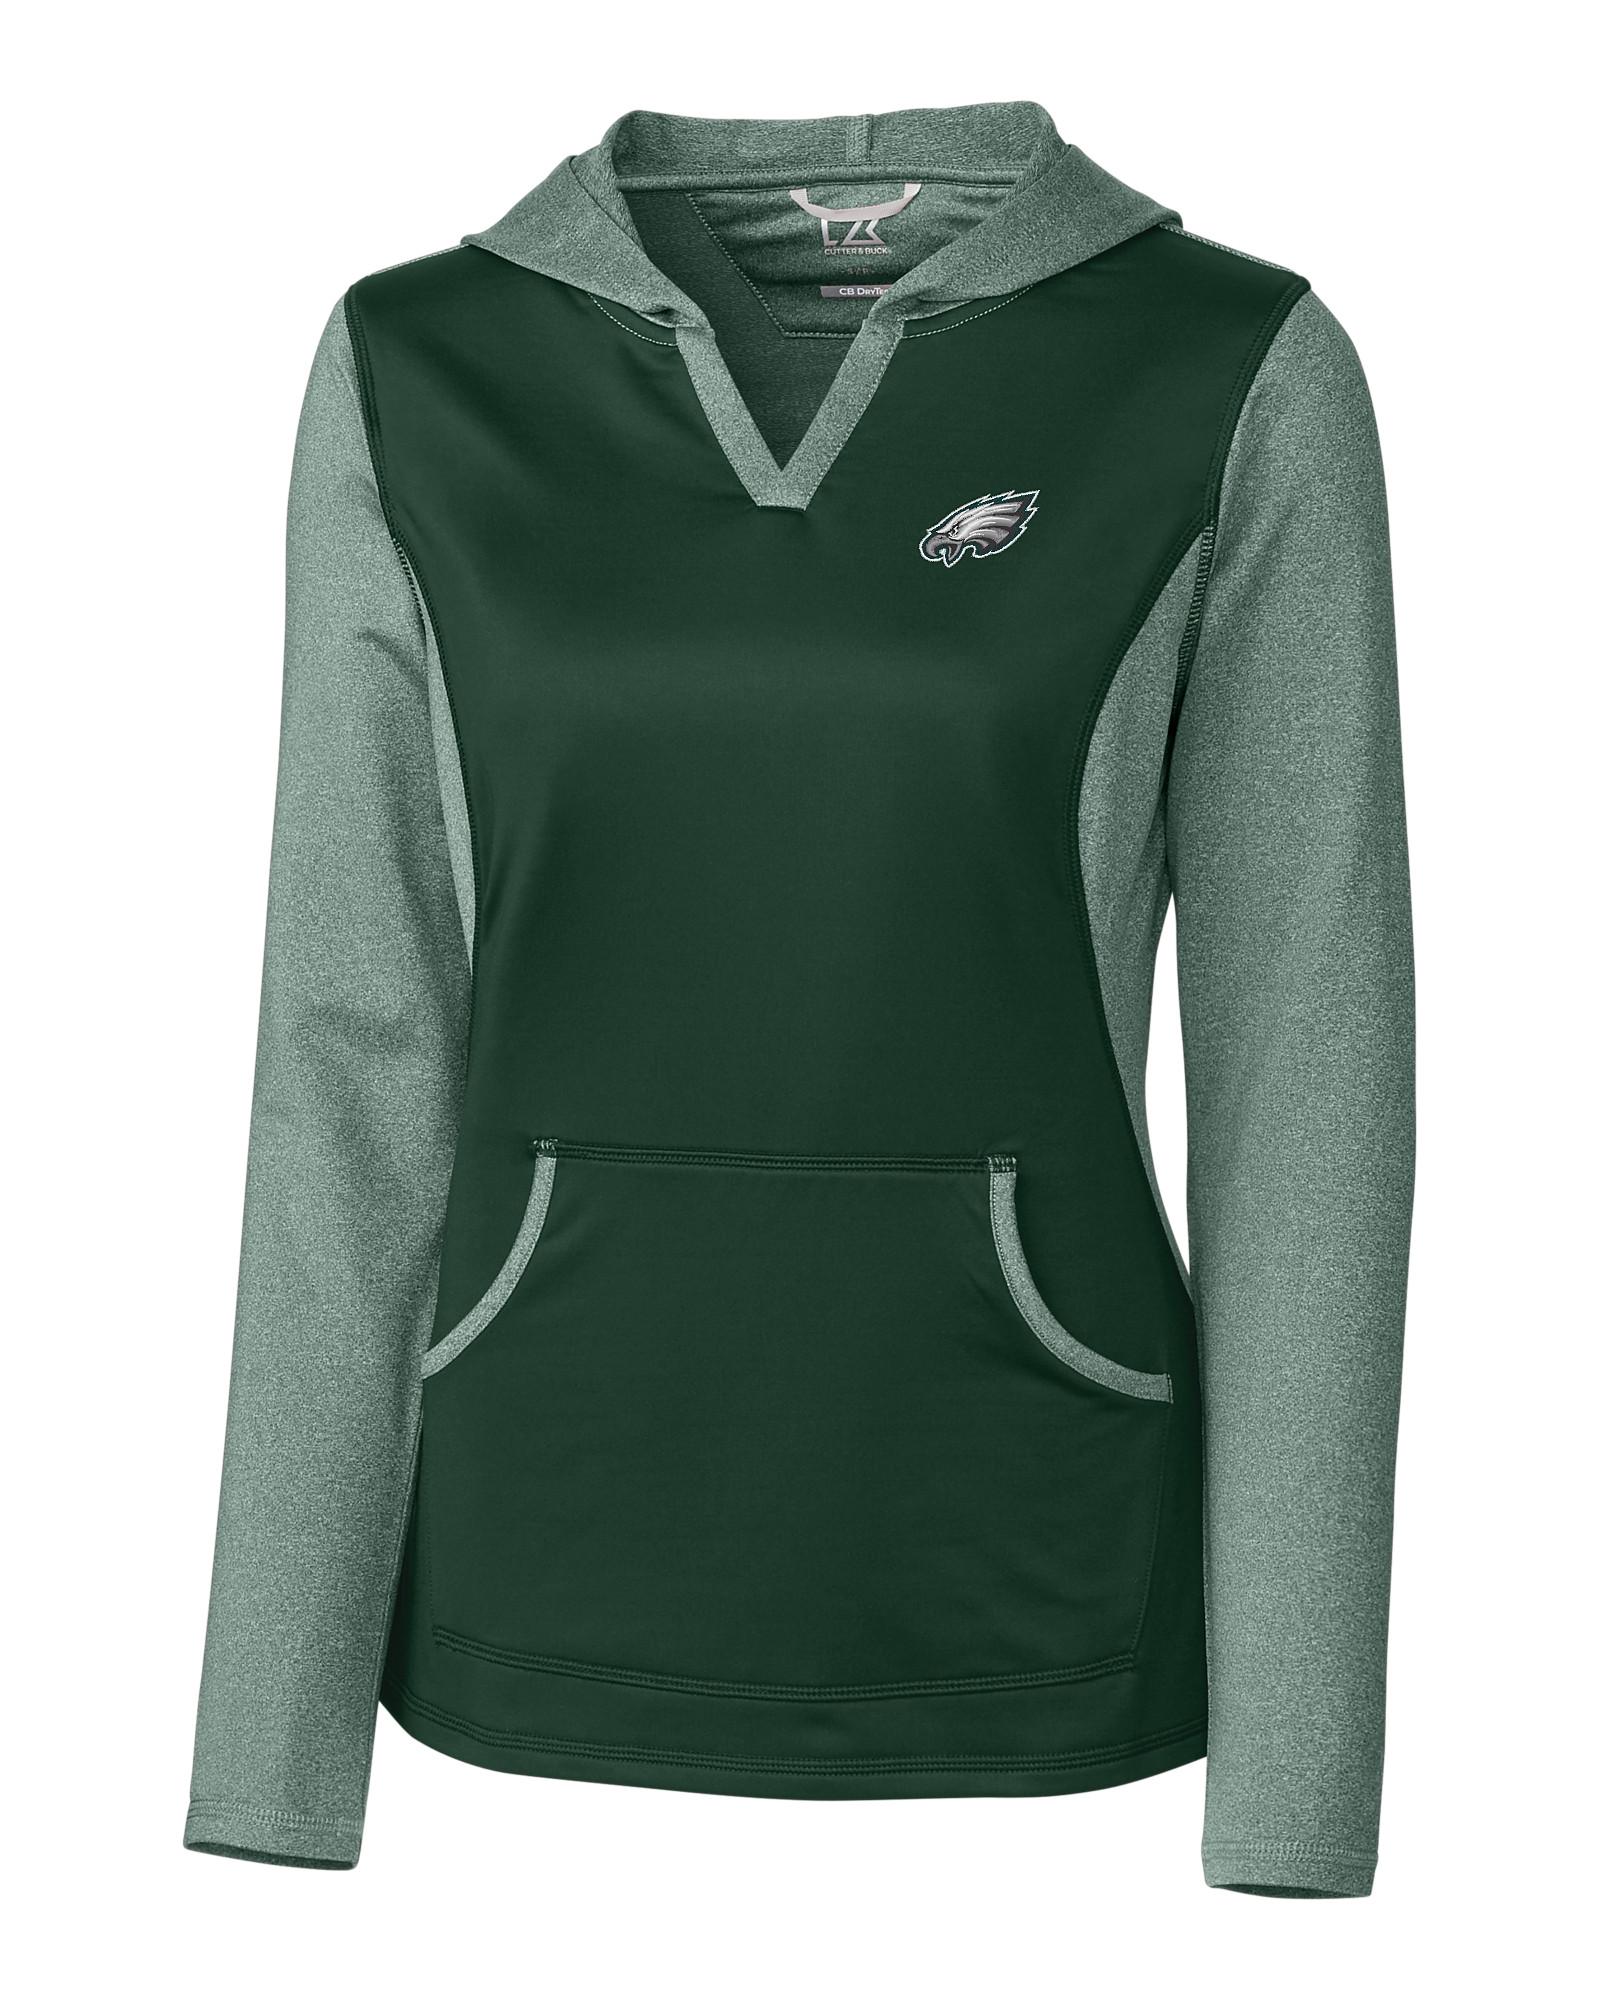 quality design f4c9c bb842 Philadelphia Eagles Ladies' Tackle Hoodie